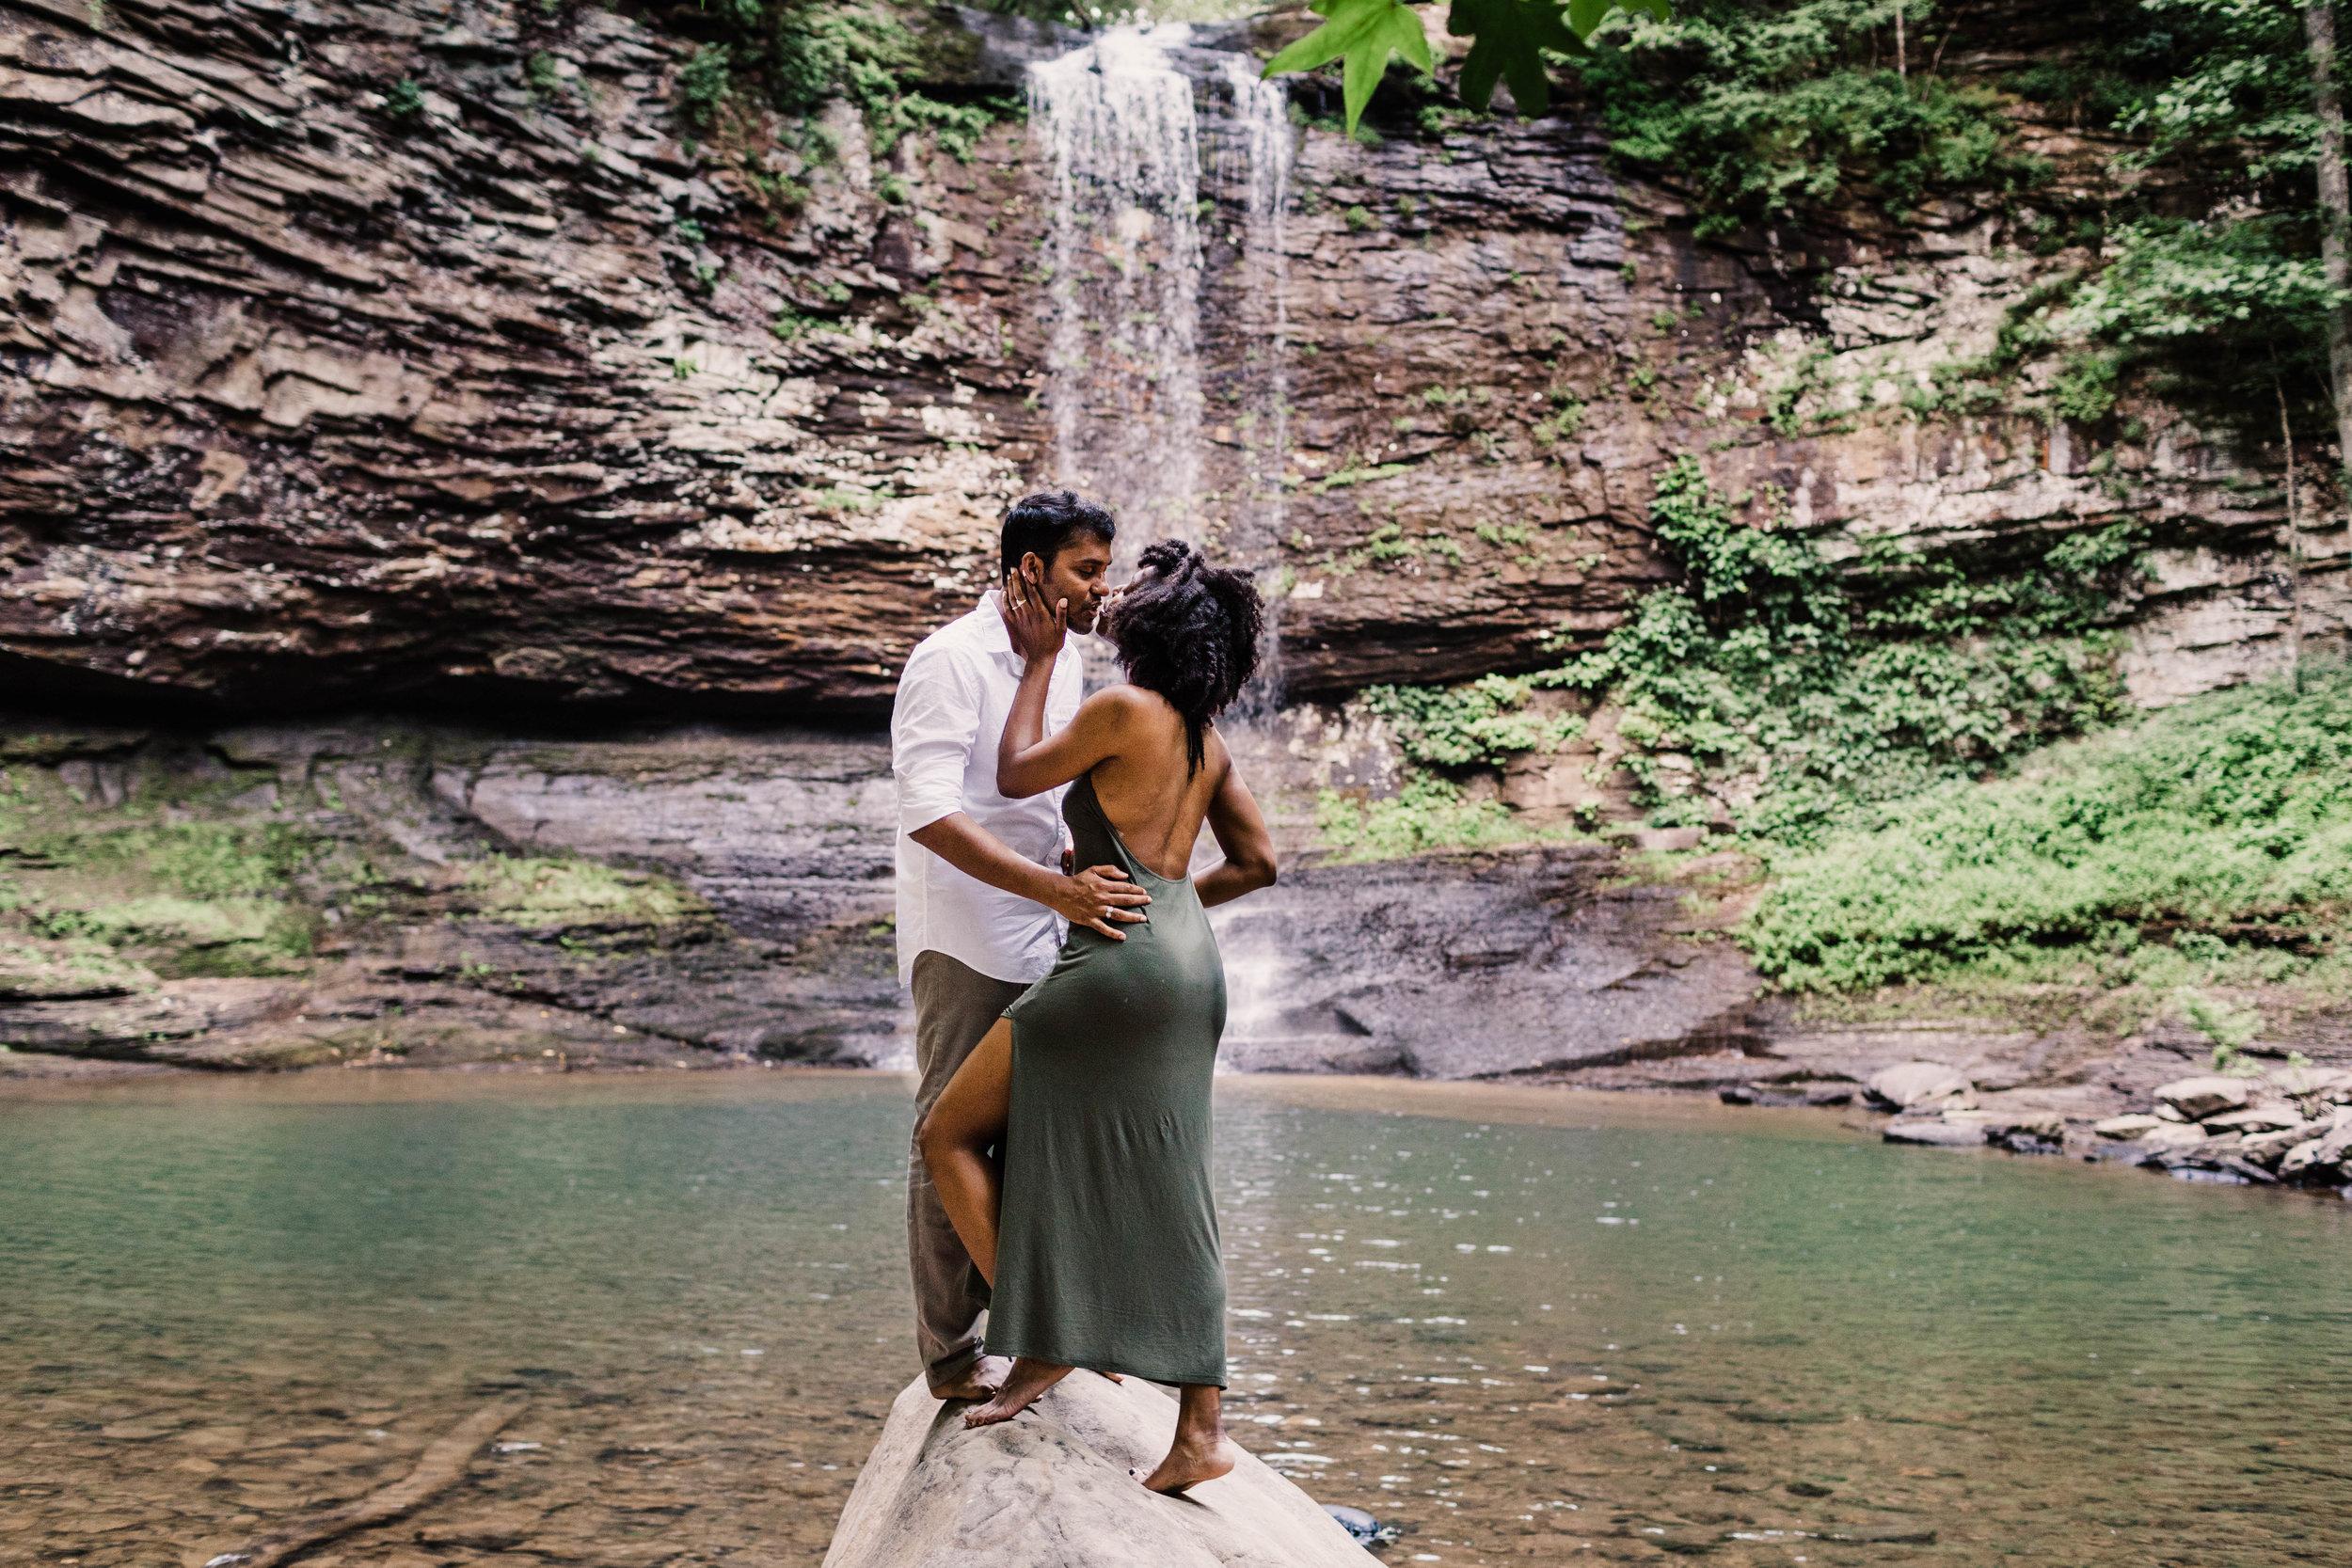 Waterfall Asheville Adventure Session | Asheville Elopement Photographer 4